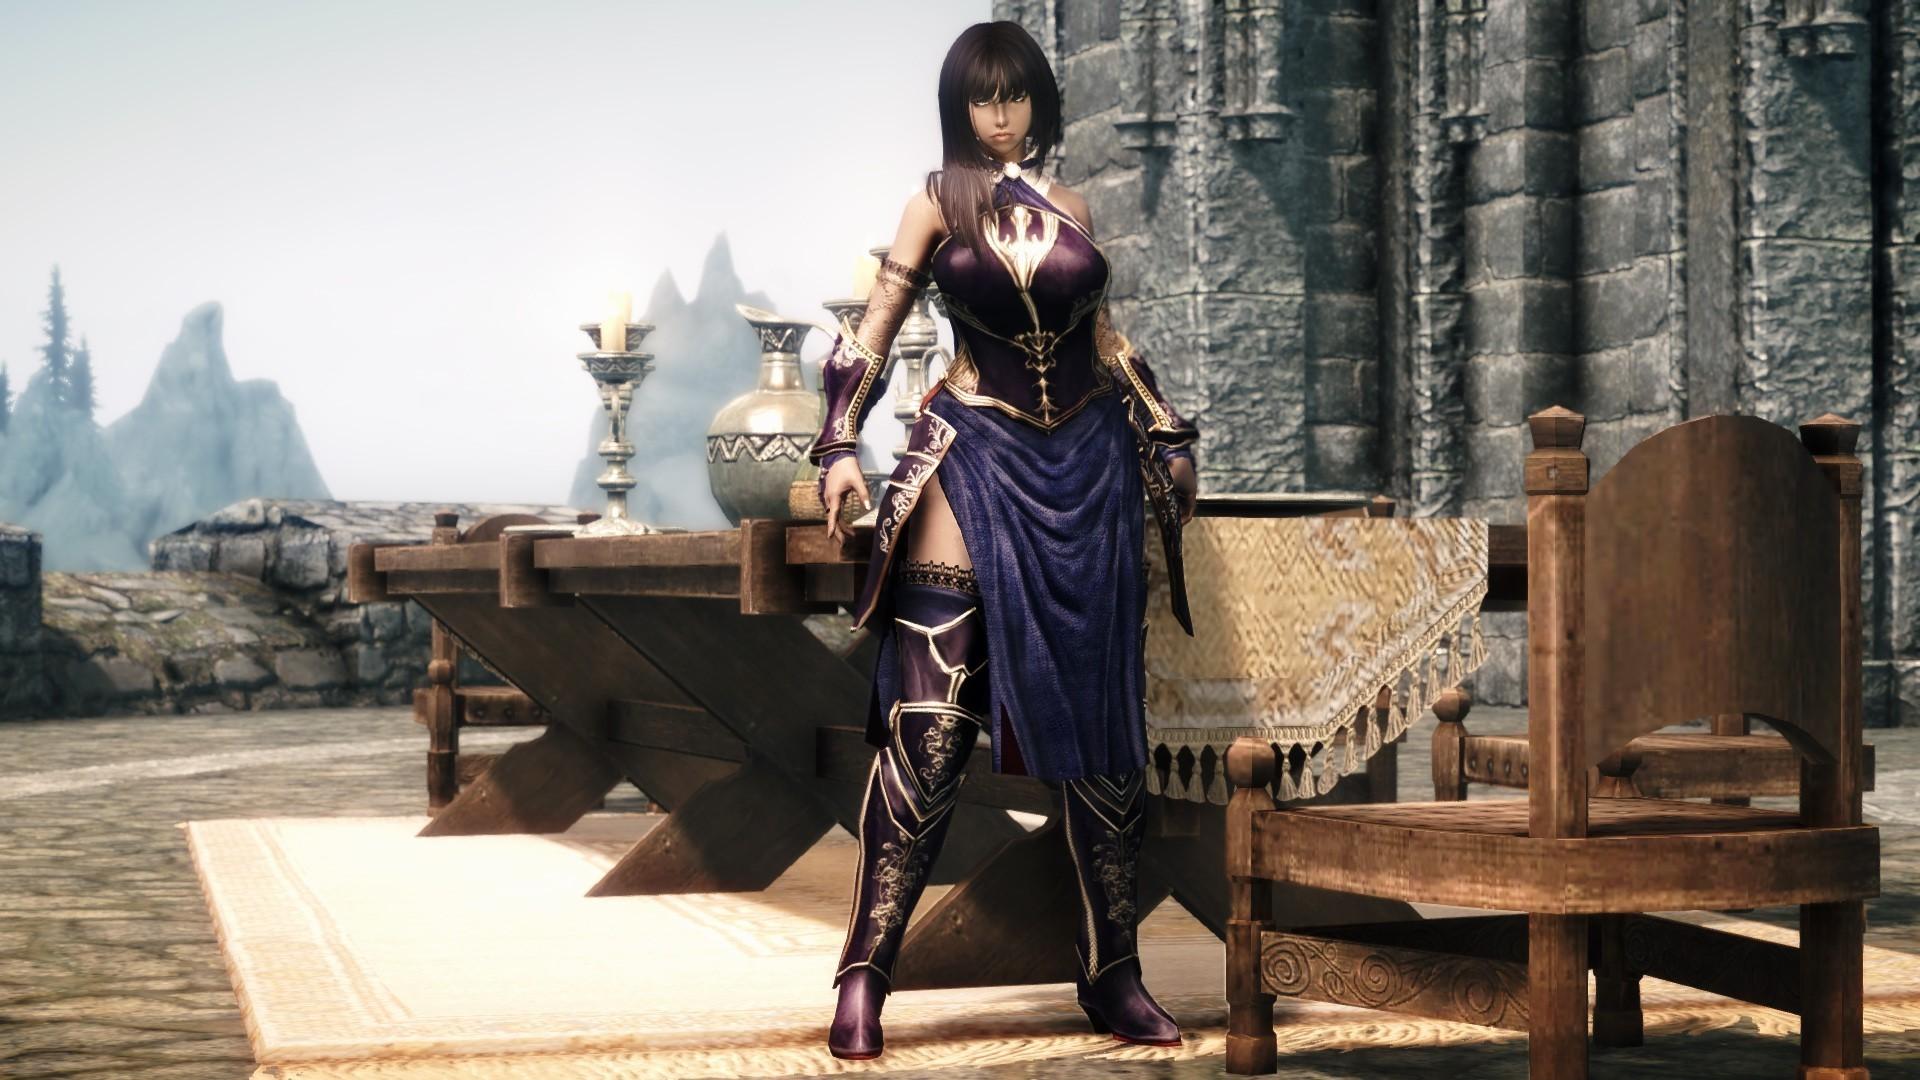 video Games, Video Game Girls, Shanoa (Castlevania), The Elder Scrolls V:  Skyrim, Mods Wallpapers HD / Desktop and Mobile Backgrounds